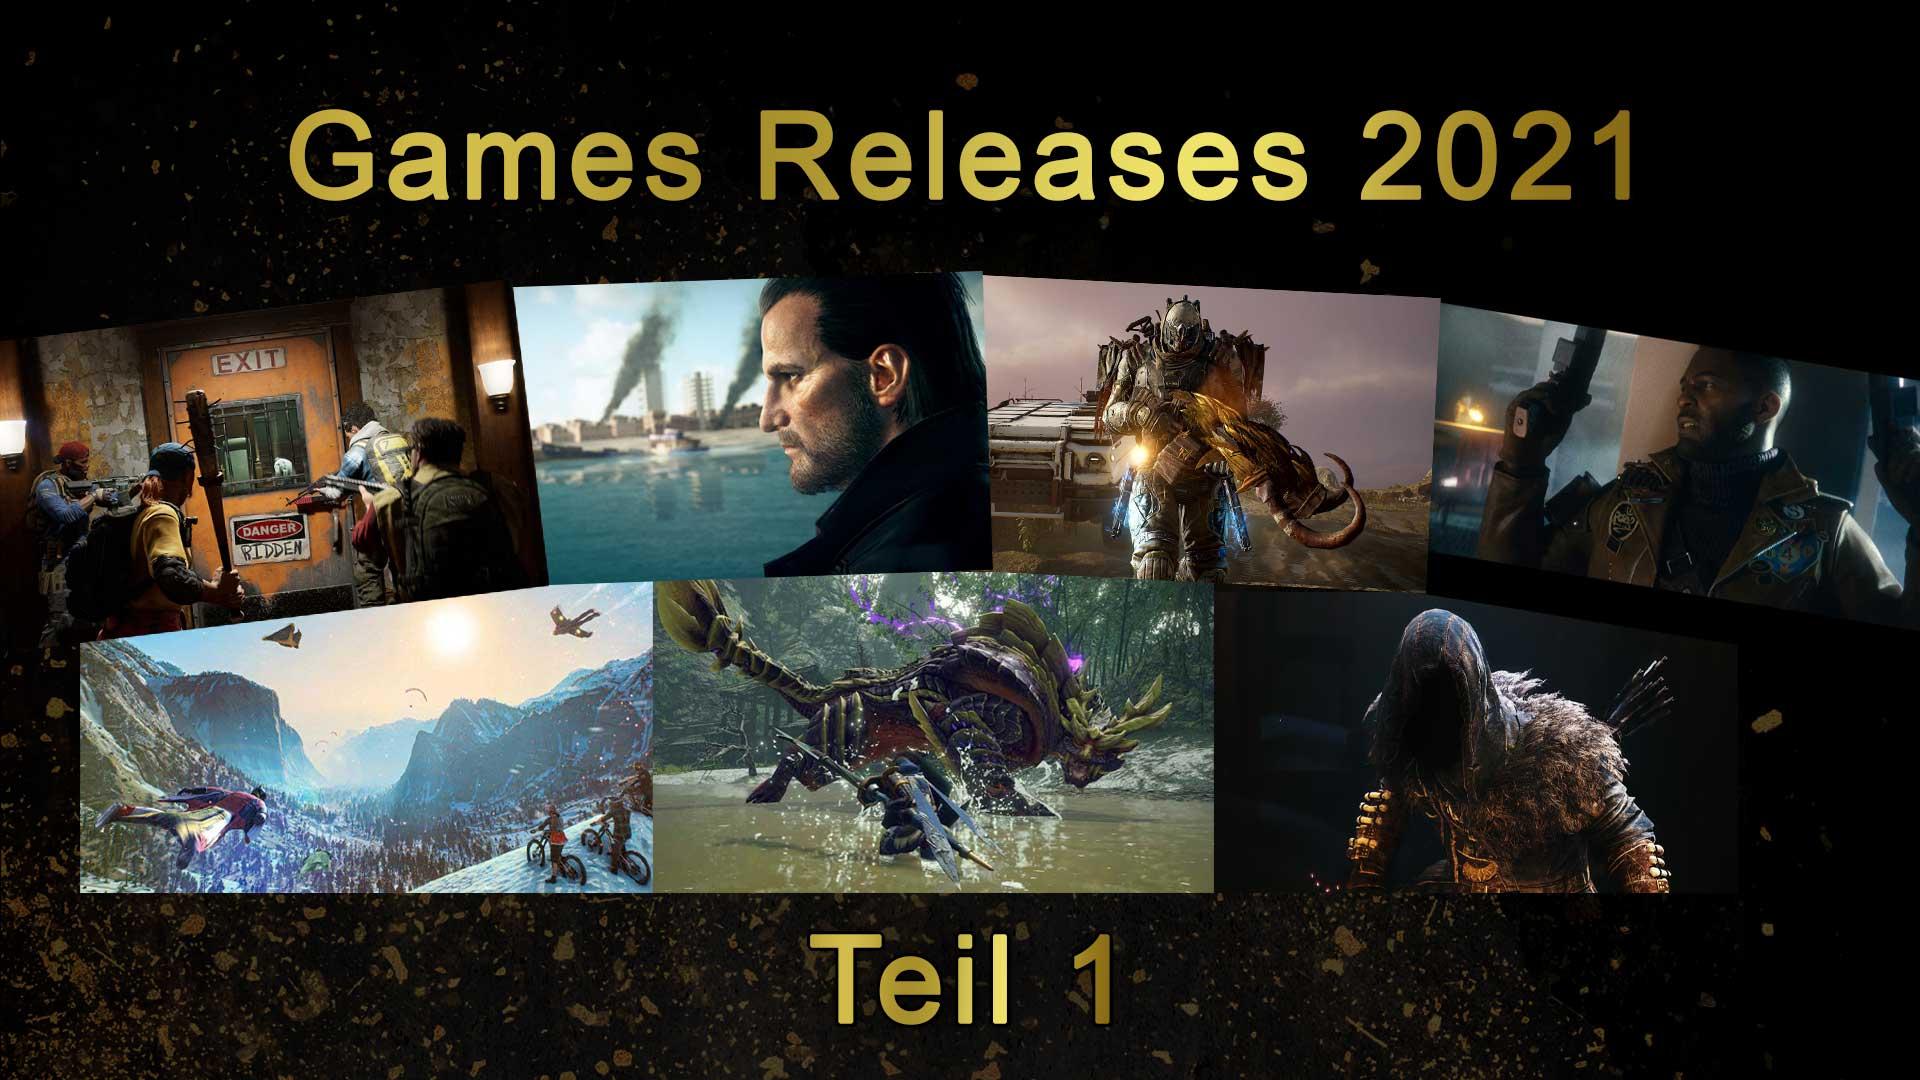 GG Games Vorschau 2021 babt